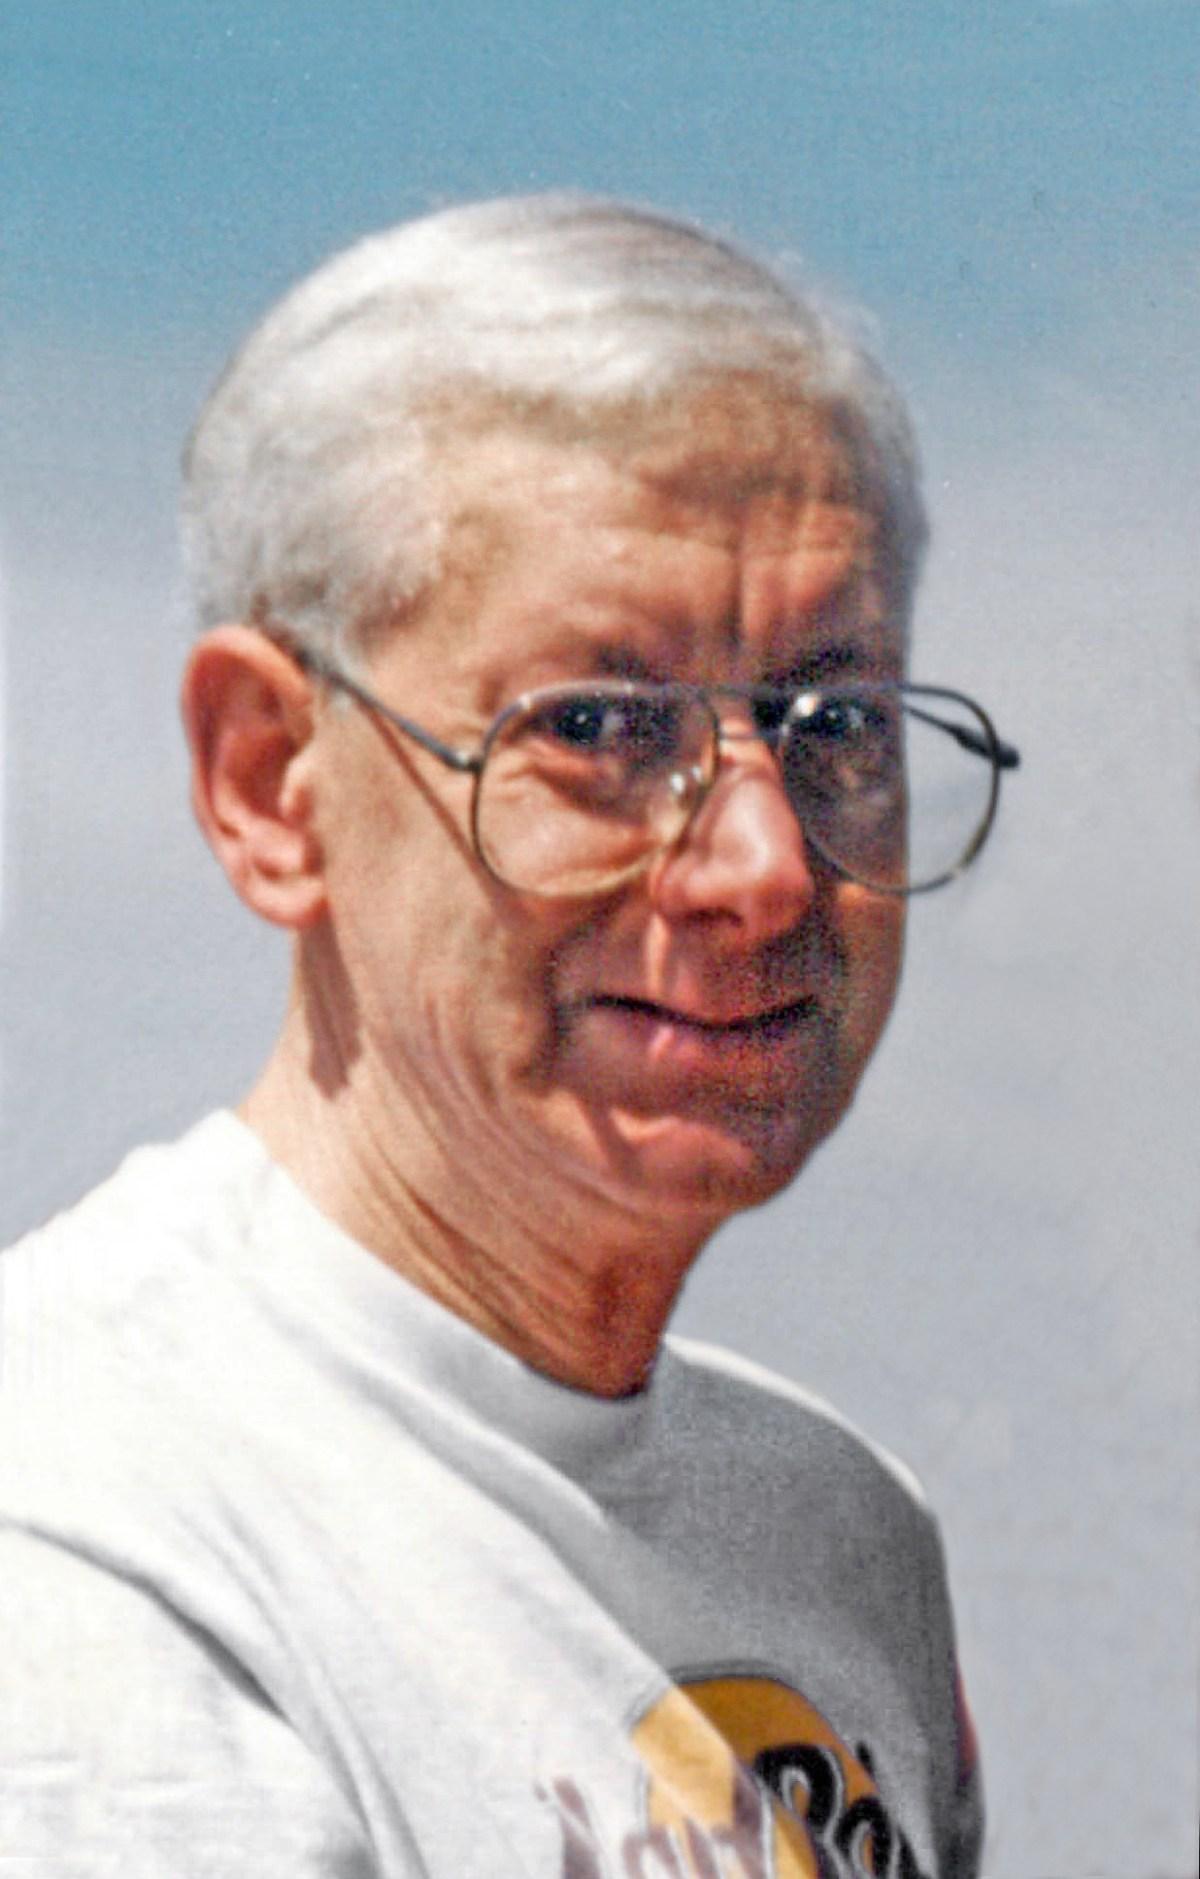 Obituary: William Dastrup Loved Sports